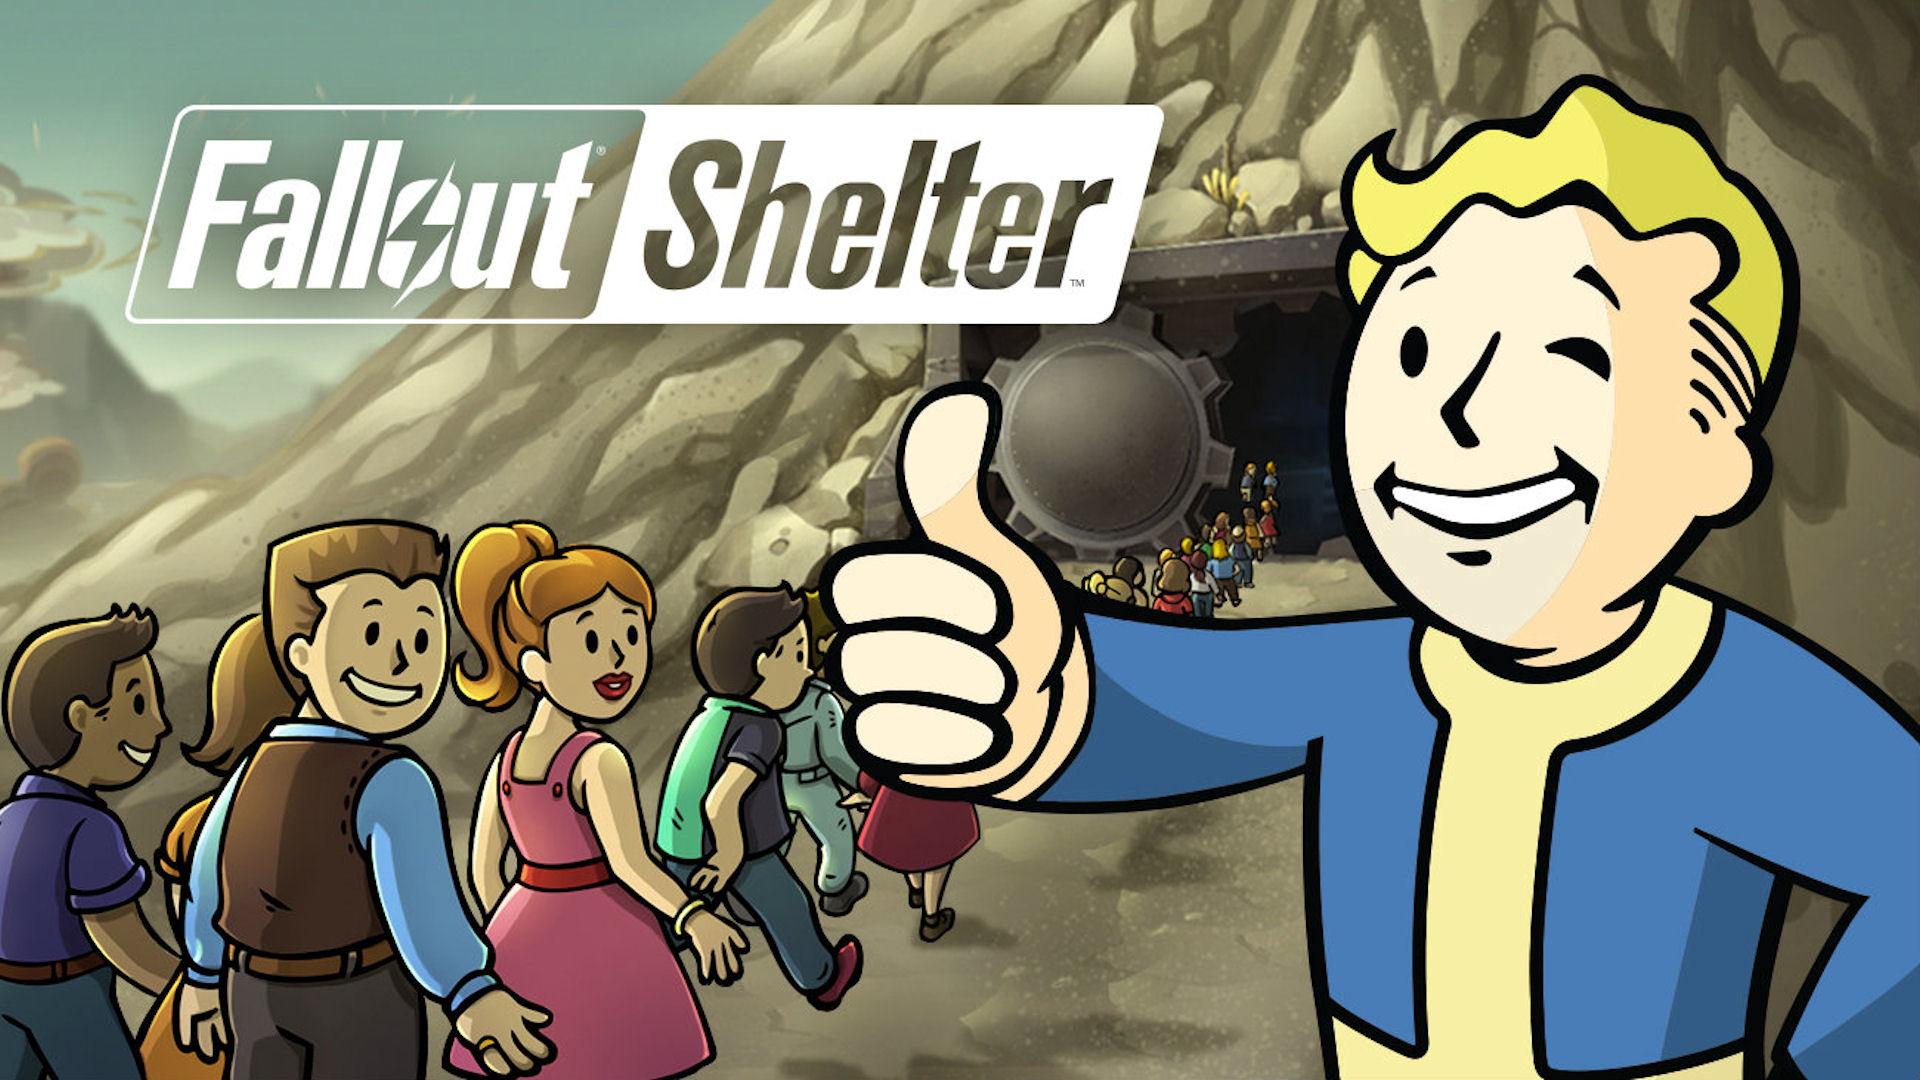 Fallout Shelter Wallpaper